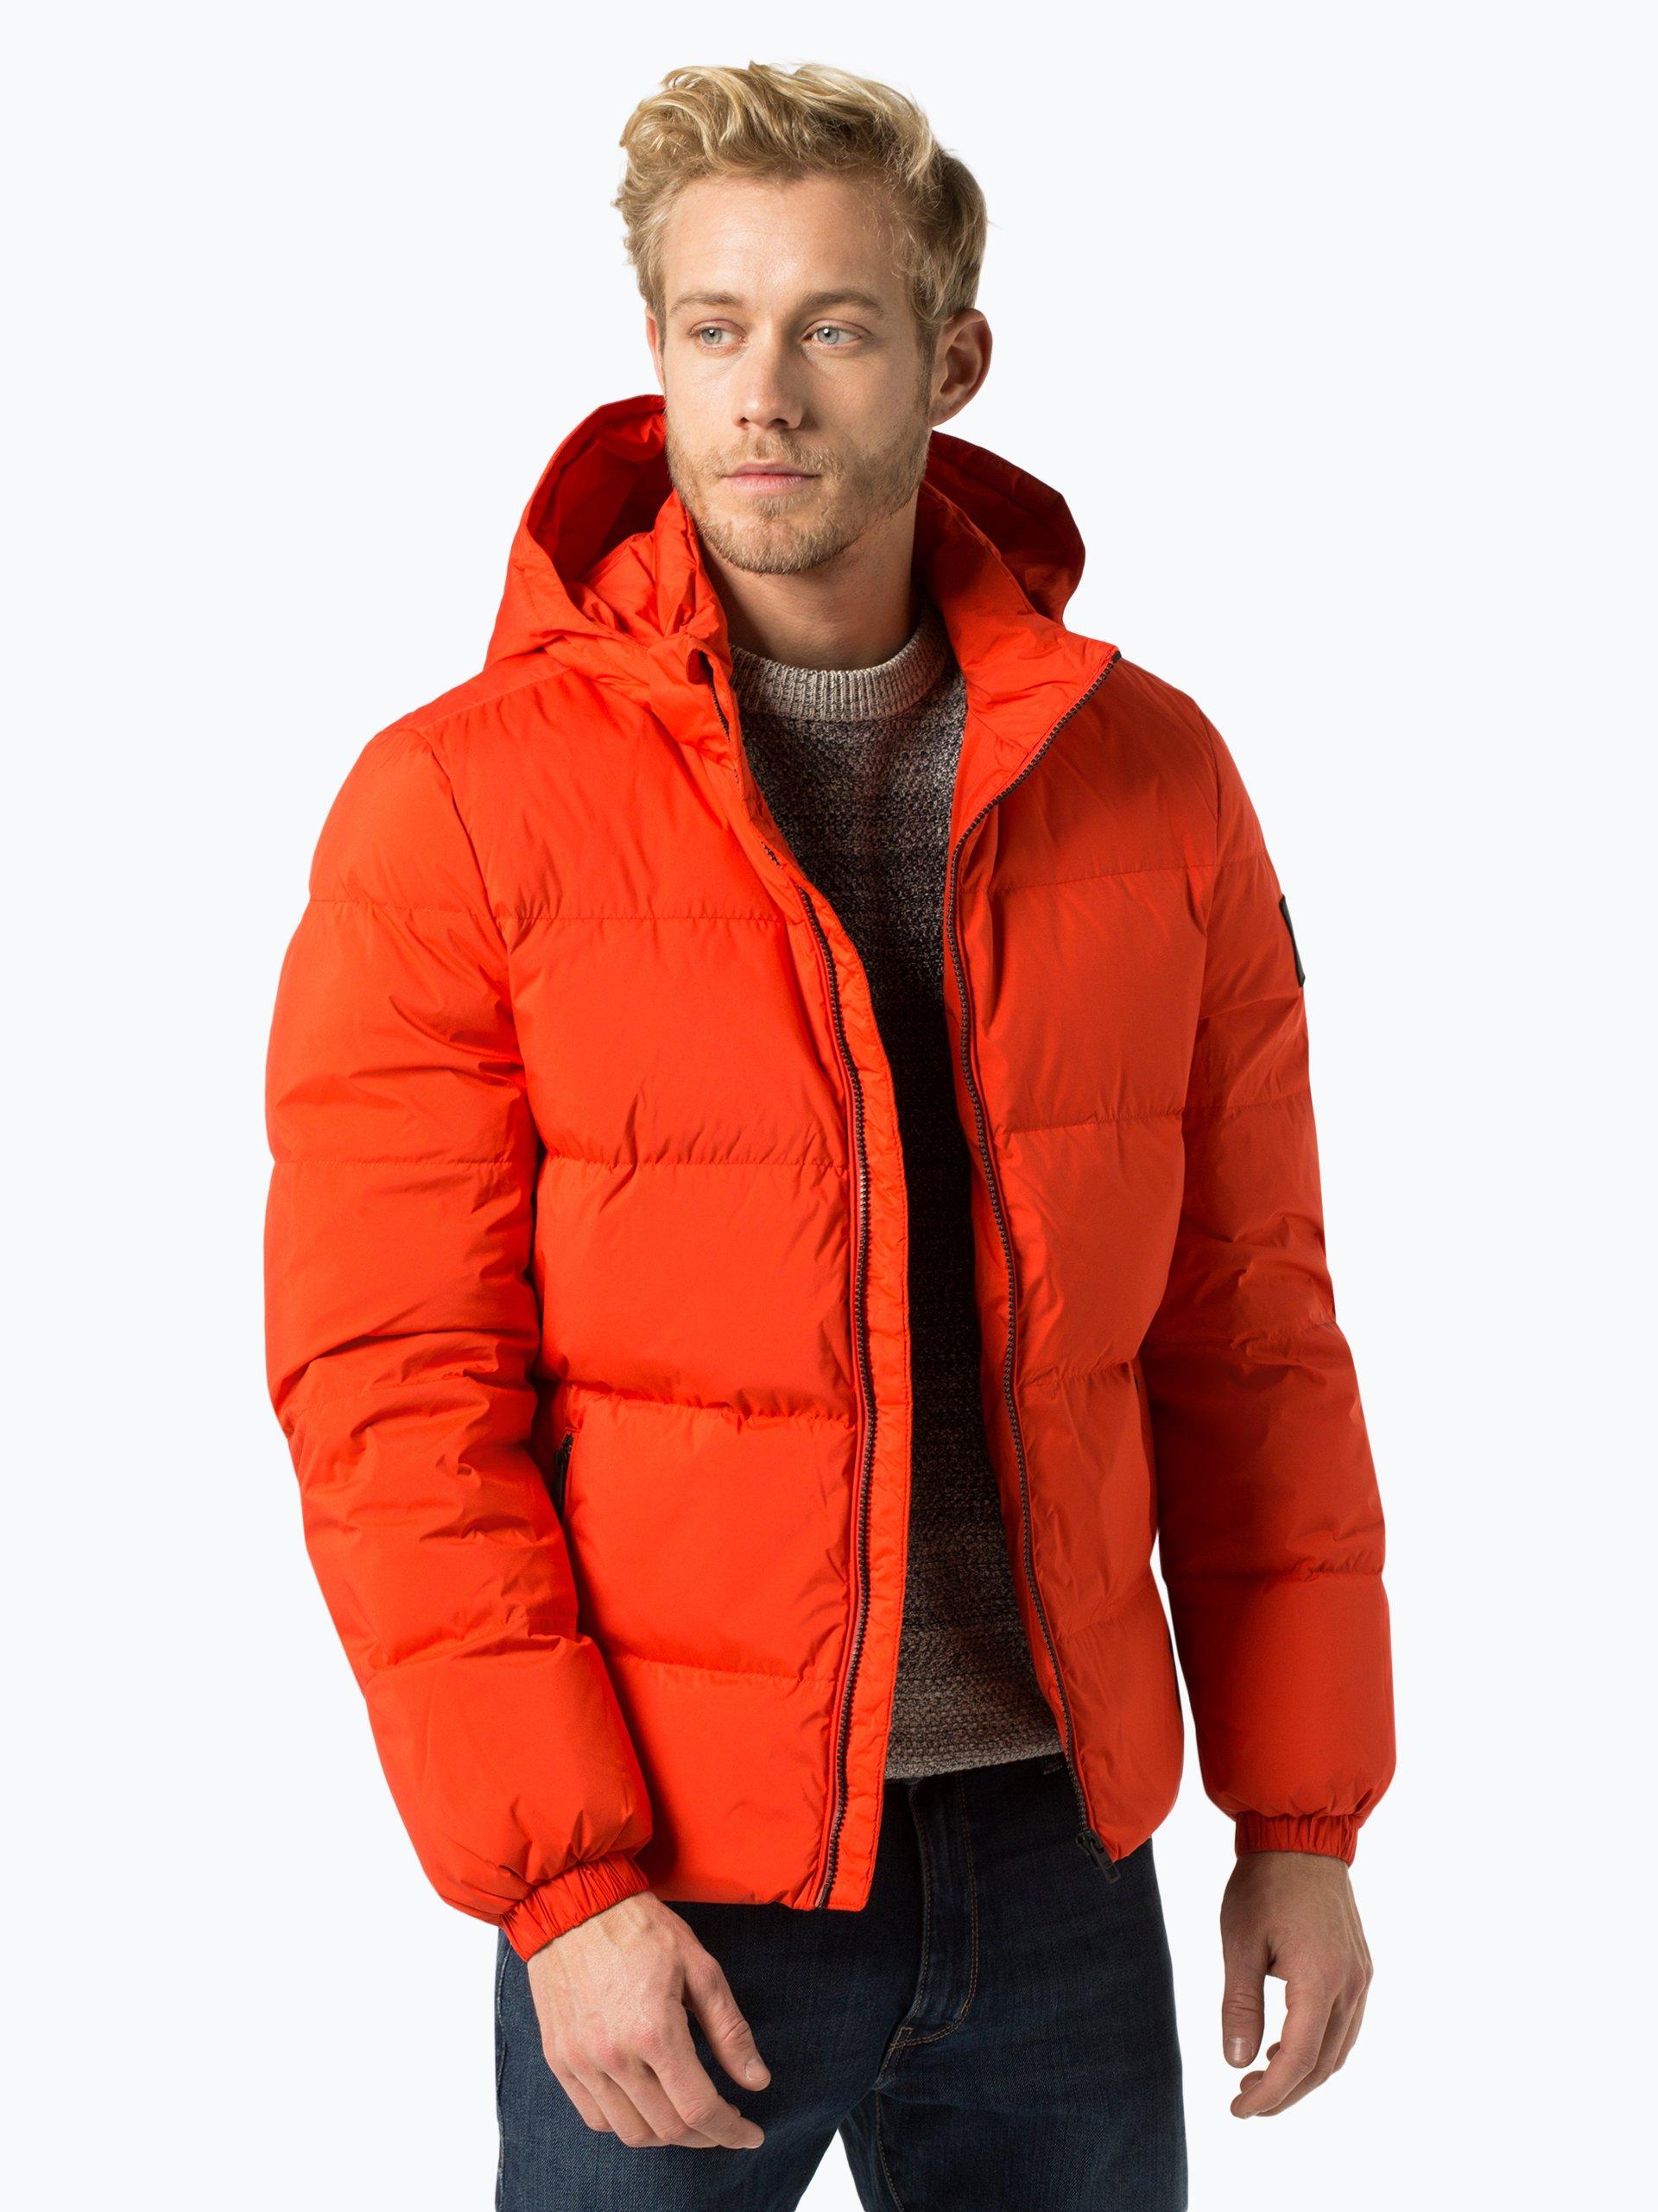 calvin klein jeans herren daunenjacke orange uni online kaufen peek und cloppenburg de. Black Bedroom Furniture Sets. Home Design Ideas